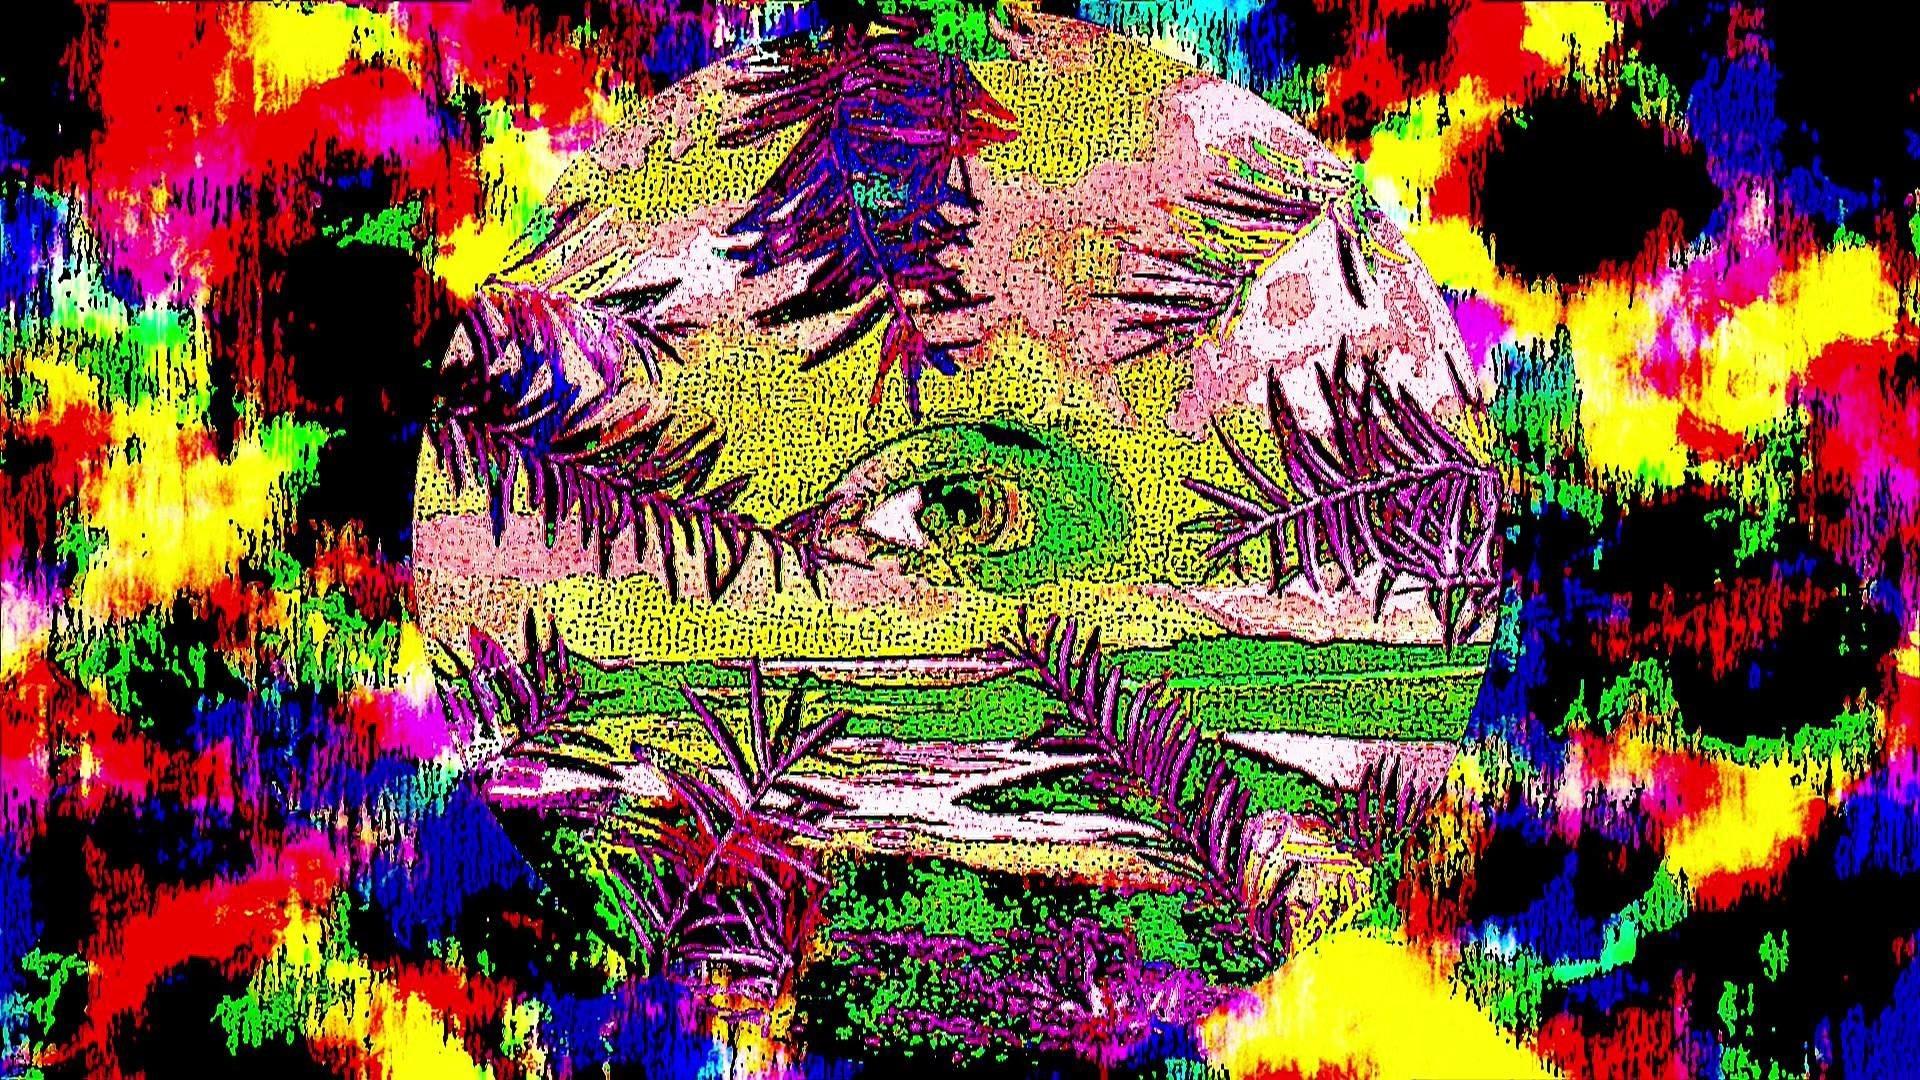 Res: 1920x1080, 2560x1440  Trippy Shroom Wallpapers HD Wallpaper Background Ã'·  Wallpapers, Background, Wallpaper, Tripy, Fractal, Trippy .